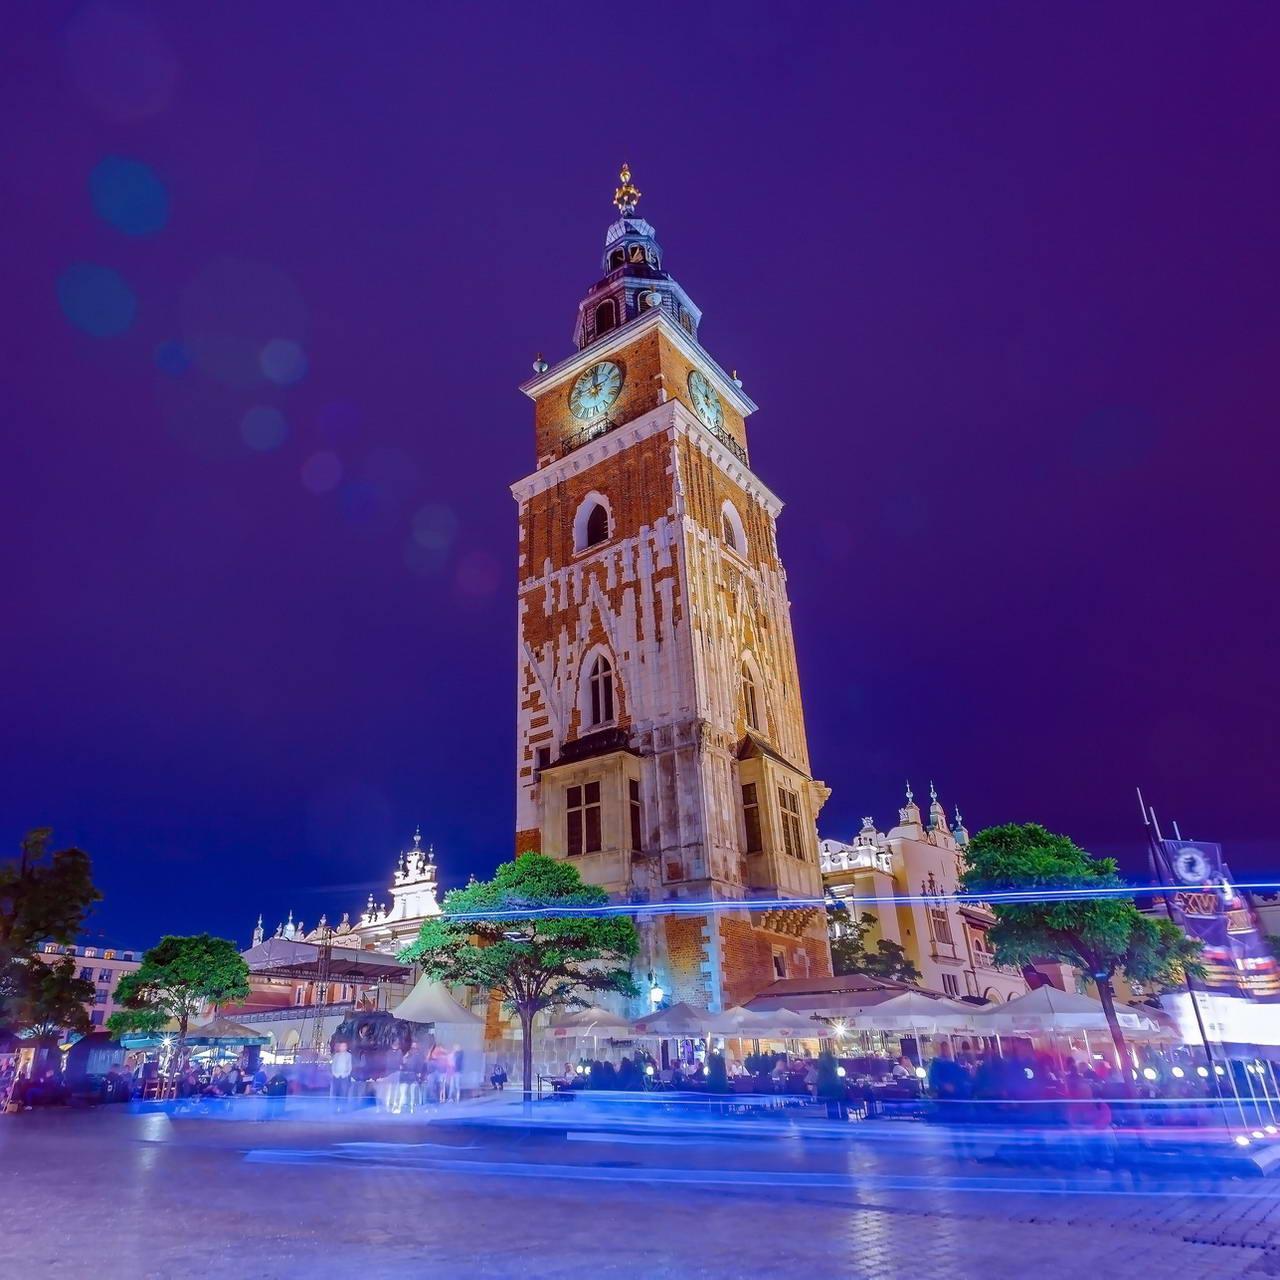 https://www.bestslovakiatours.com/wp-content/uploads/2021/09/Best-Slovakia-Tours_Poland1.jpg